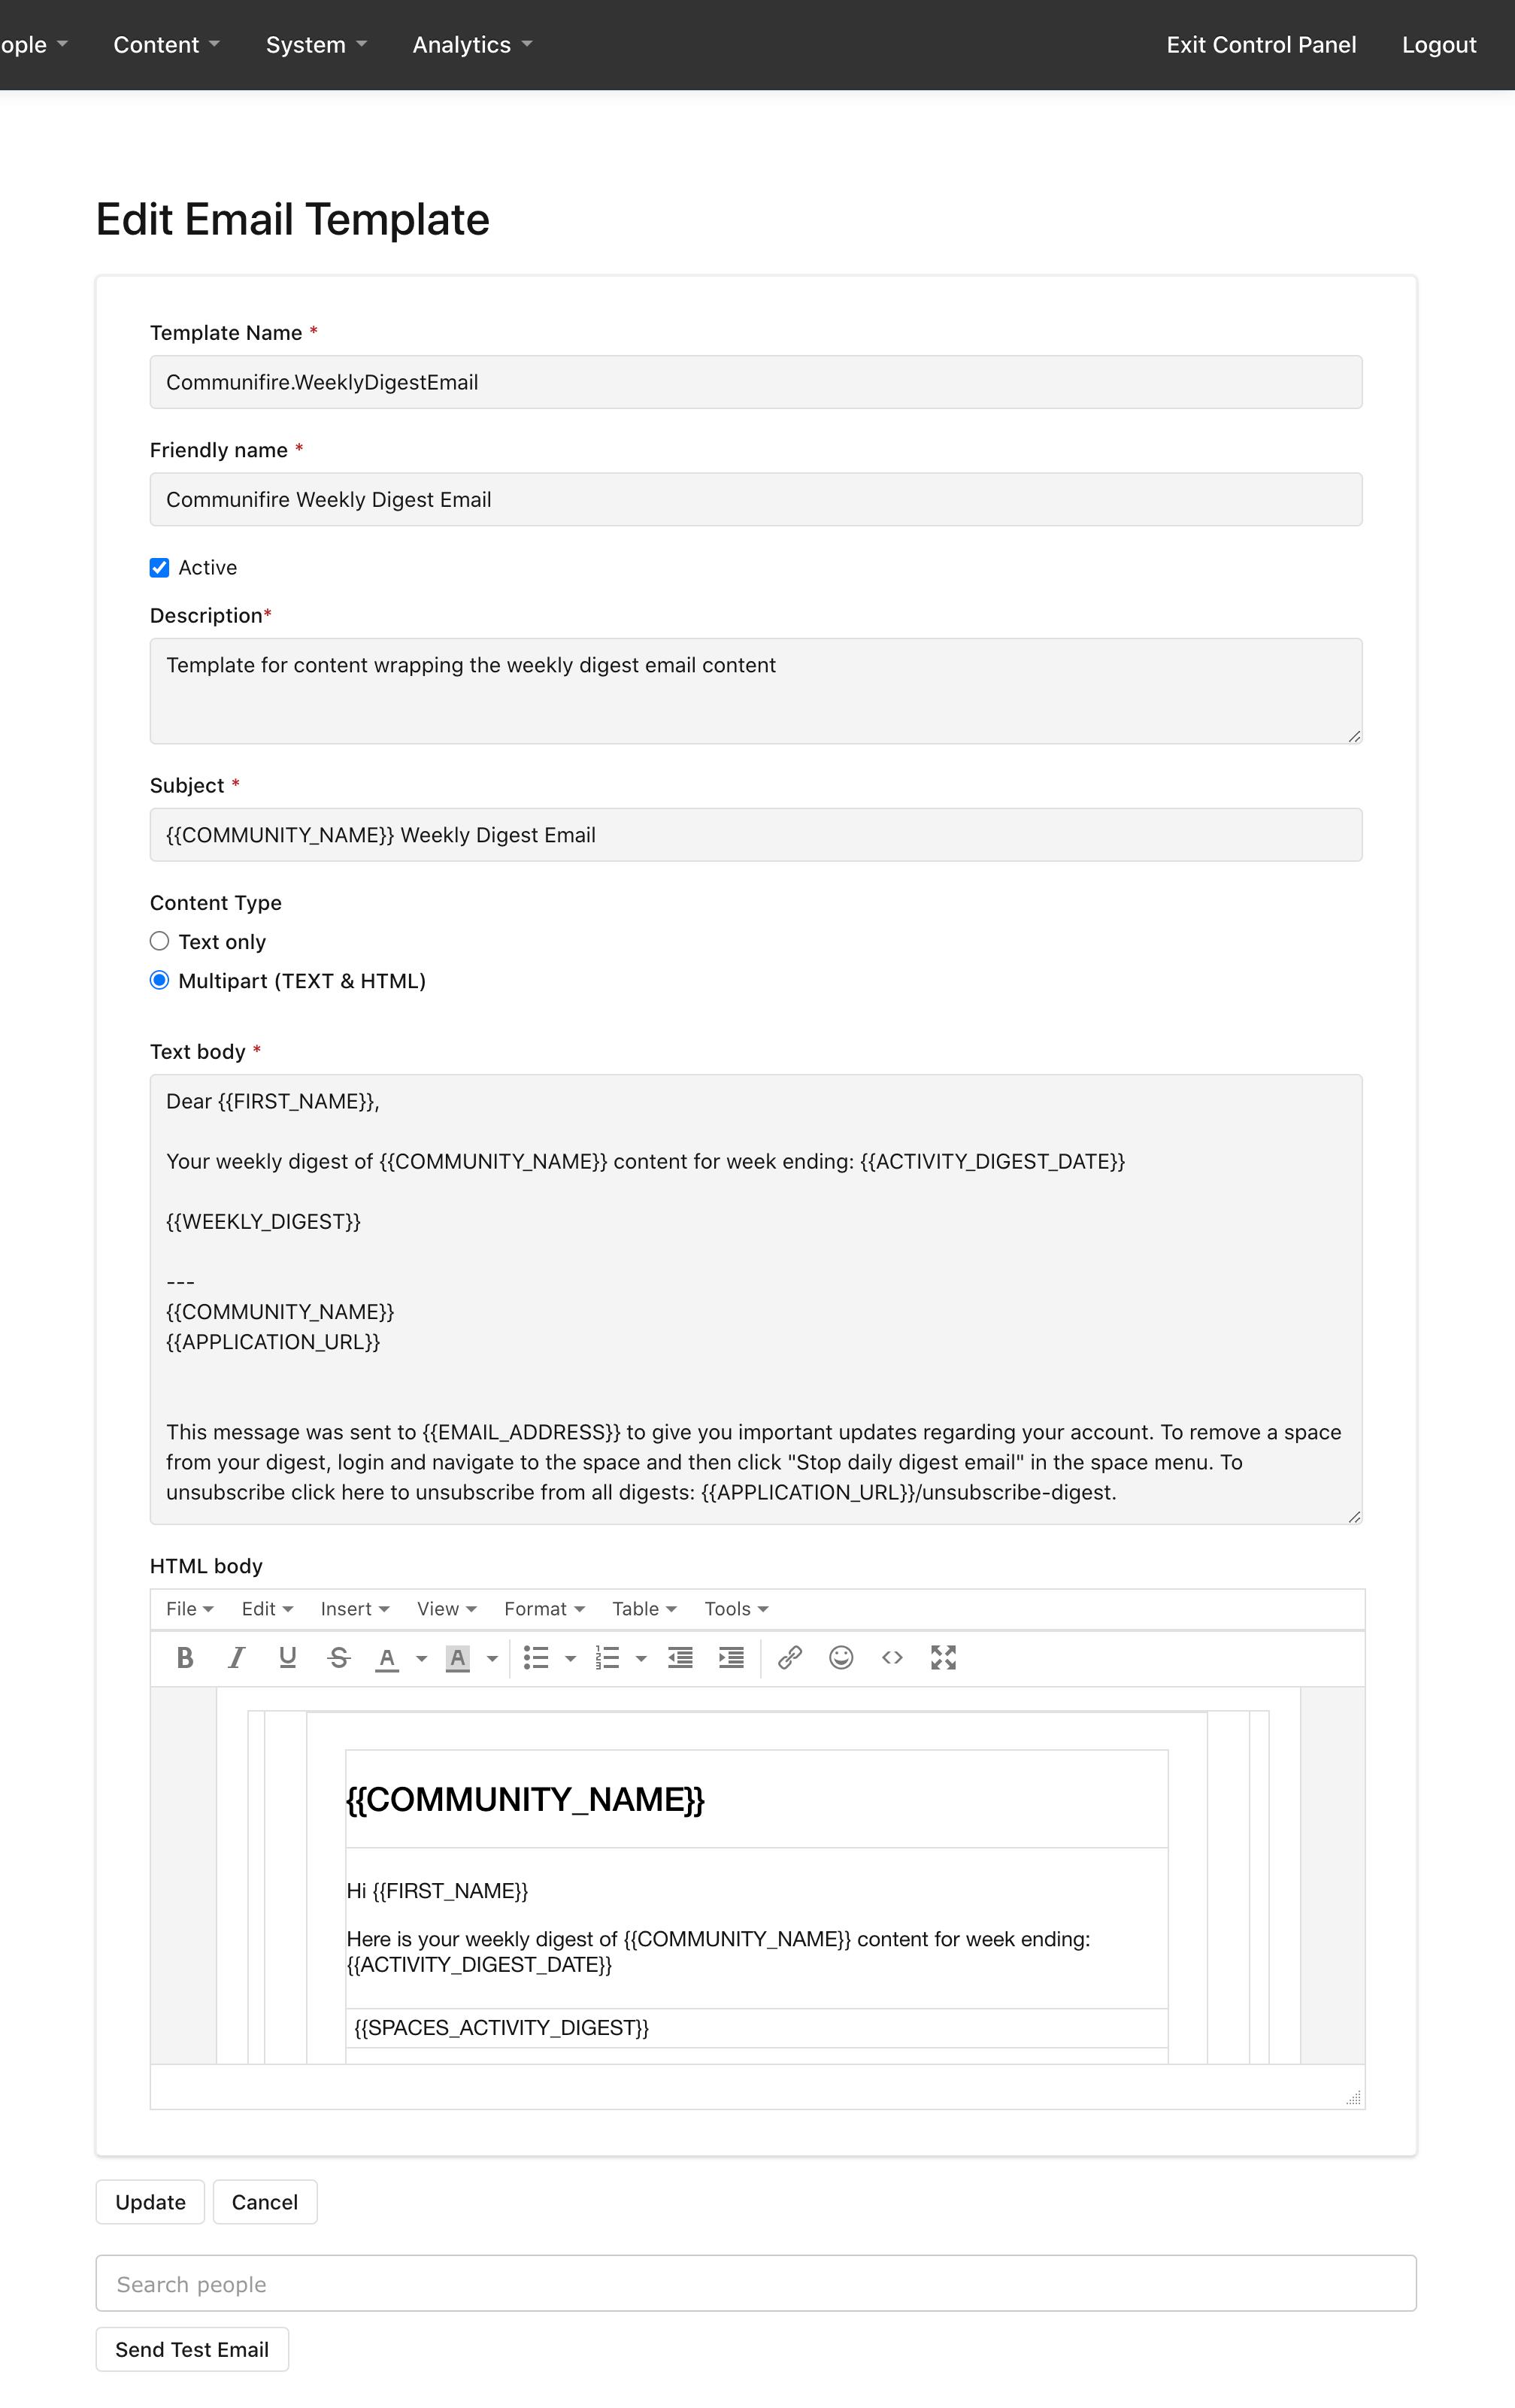 Editing Communifire.WeeklyDigestEmail